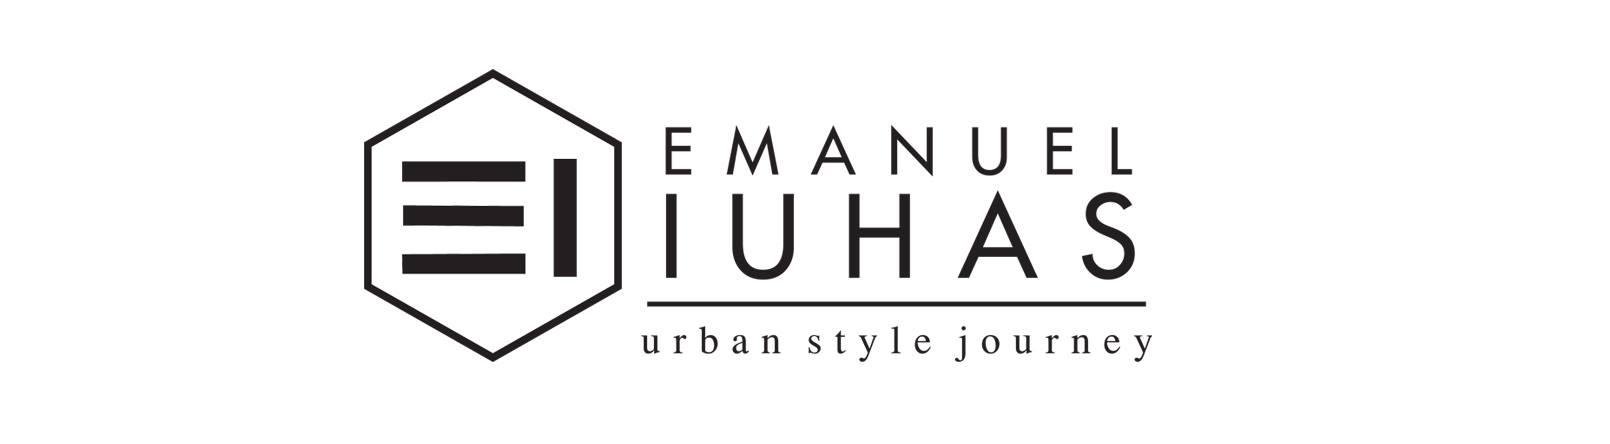 Emanuel Iuhas | Urban Style Journey